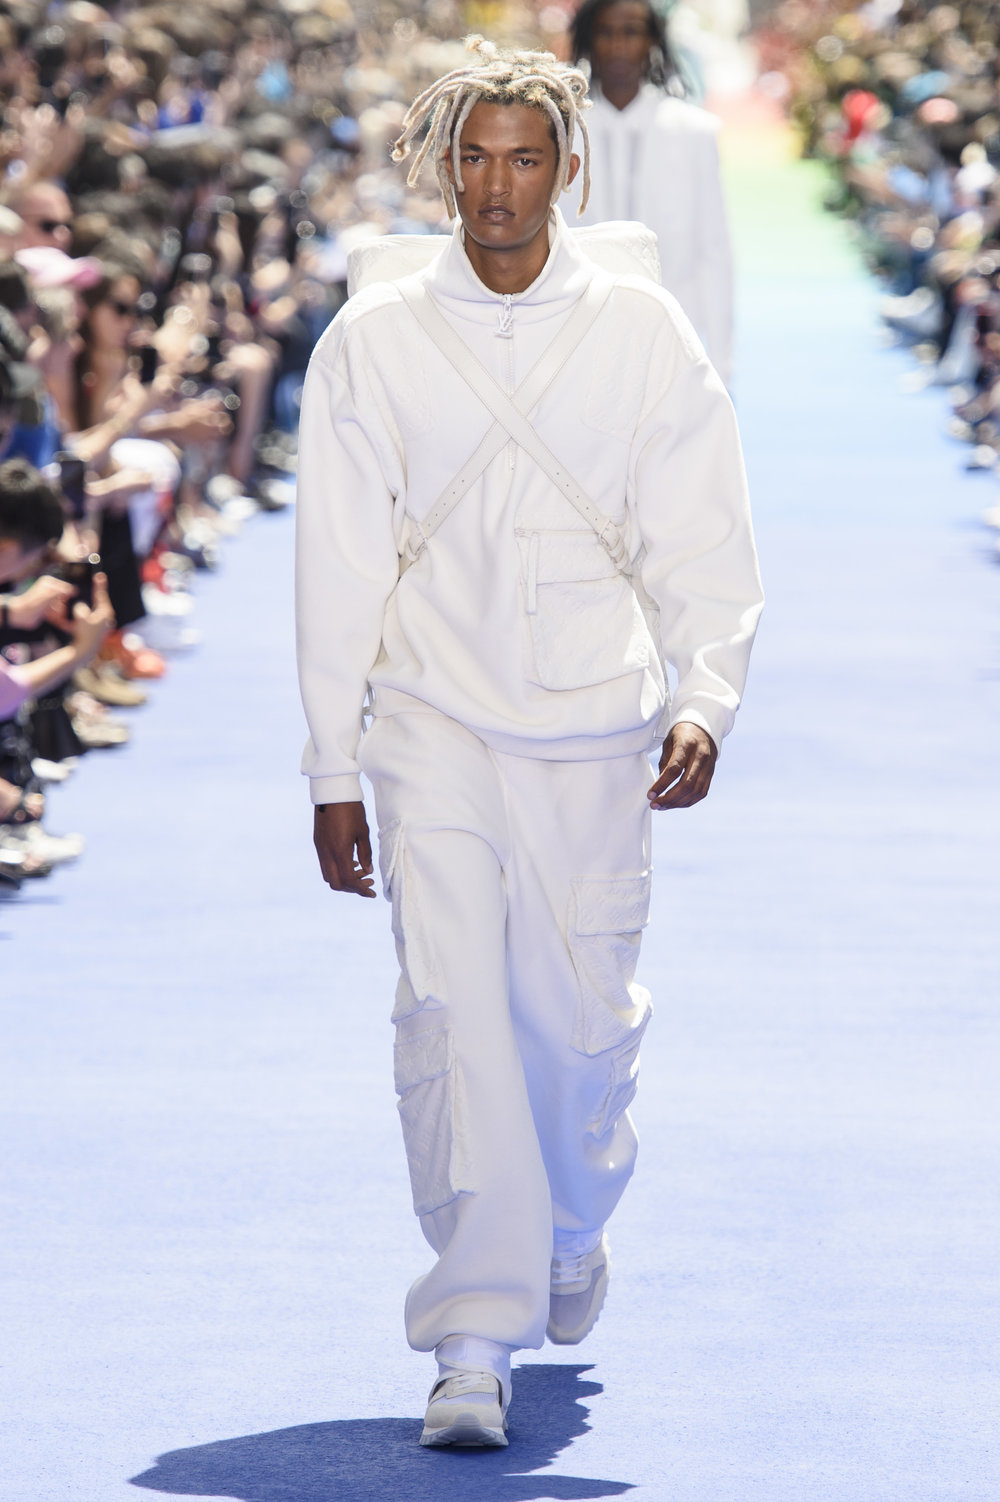 03_Louis_Vuitton_original_vui_prs_ss19_011.jpg